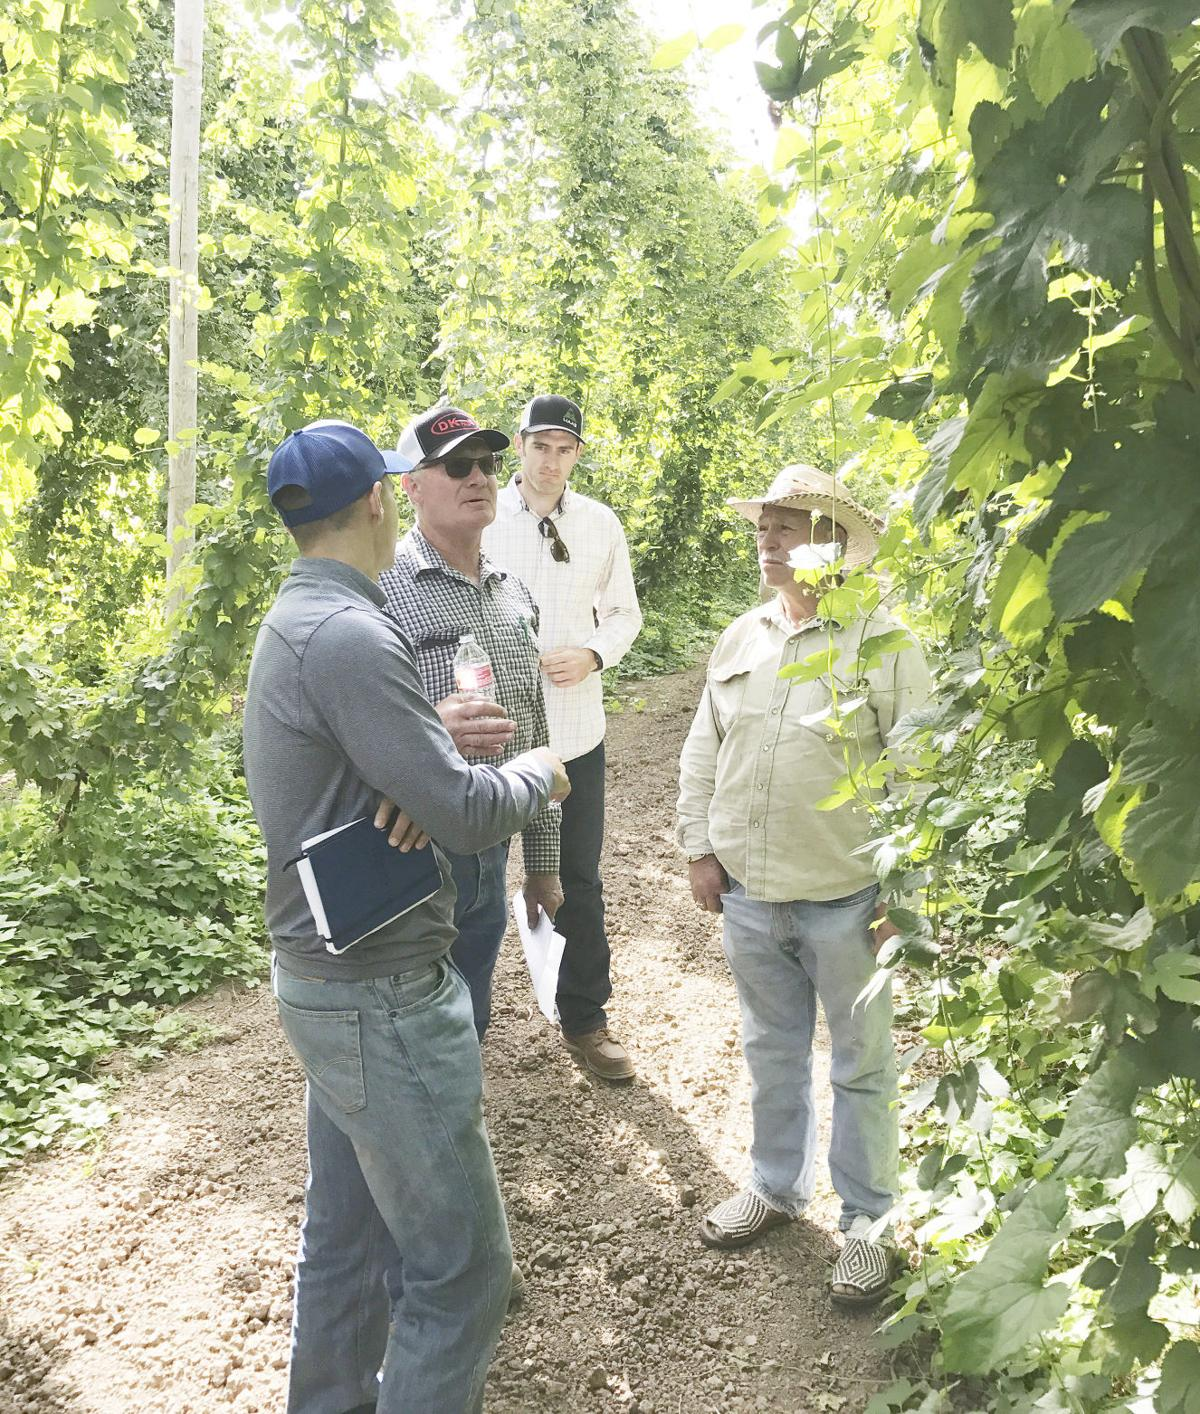 New public cultivar aims to 'Triumph' in hop market